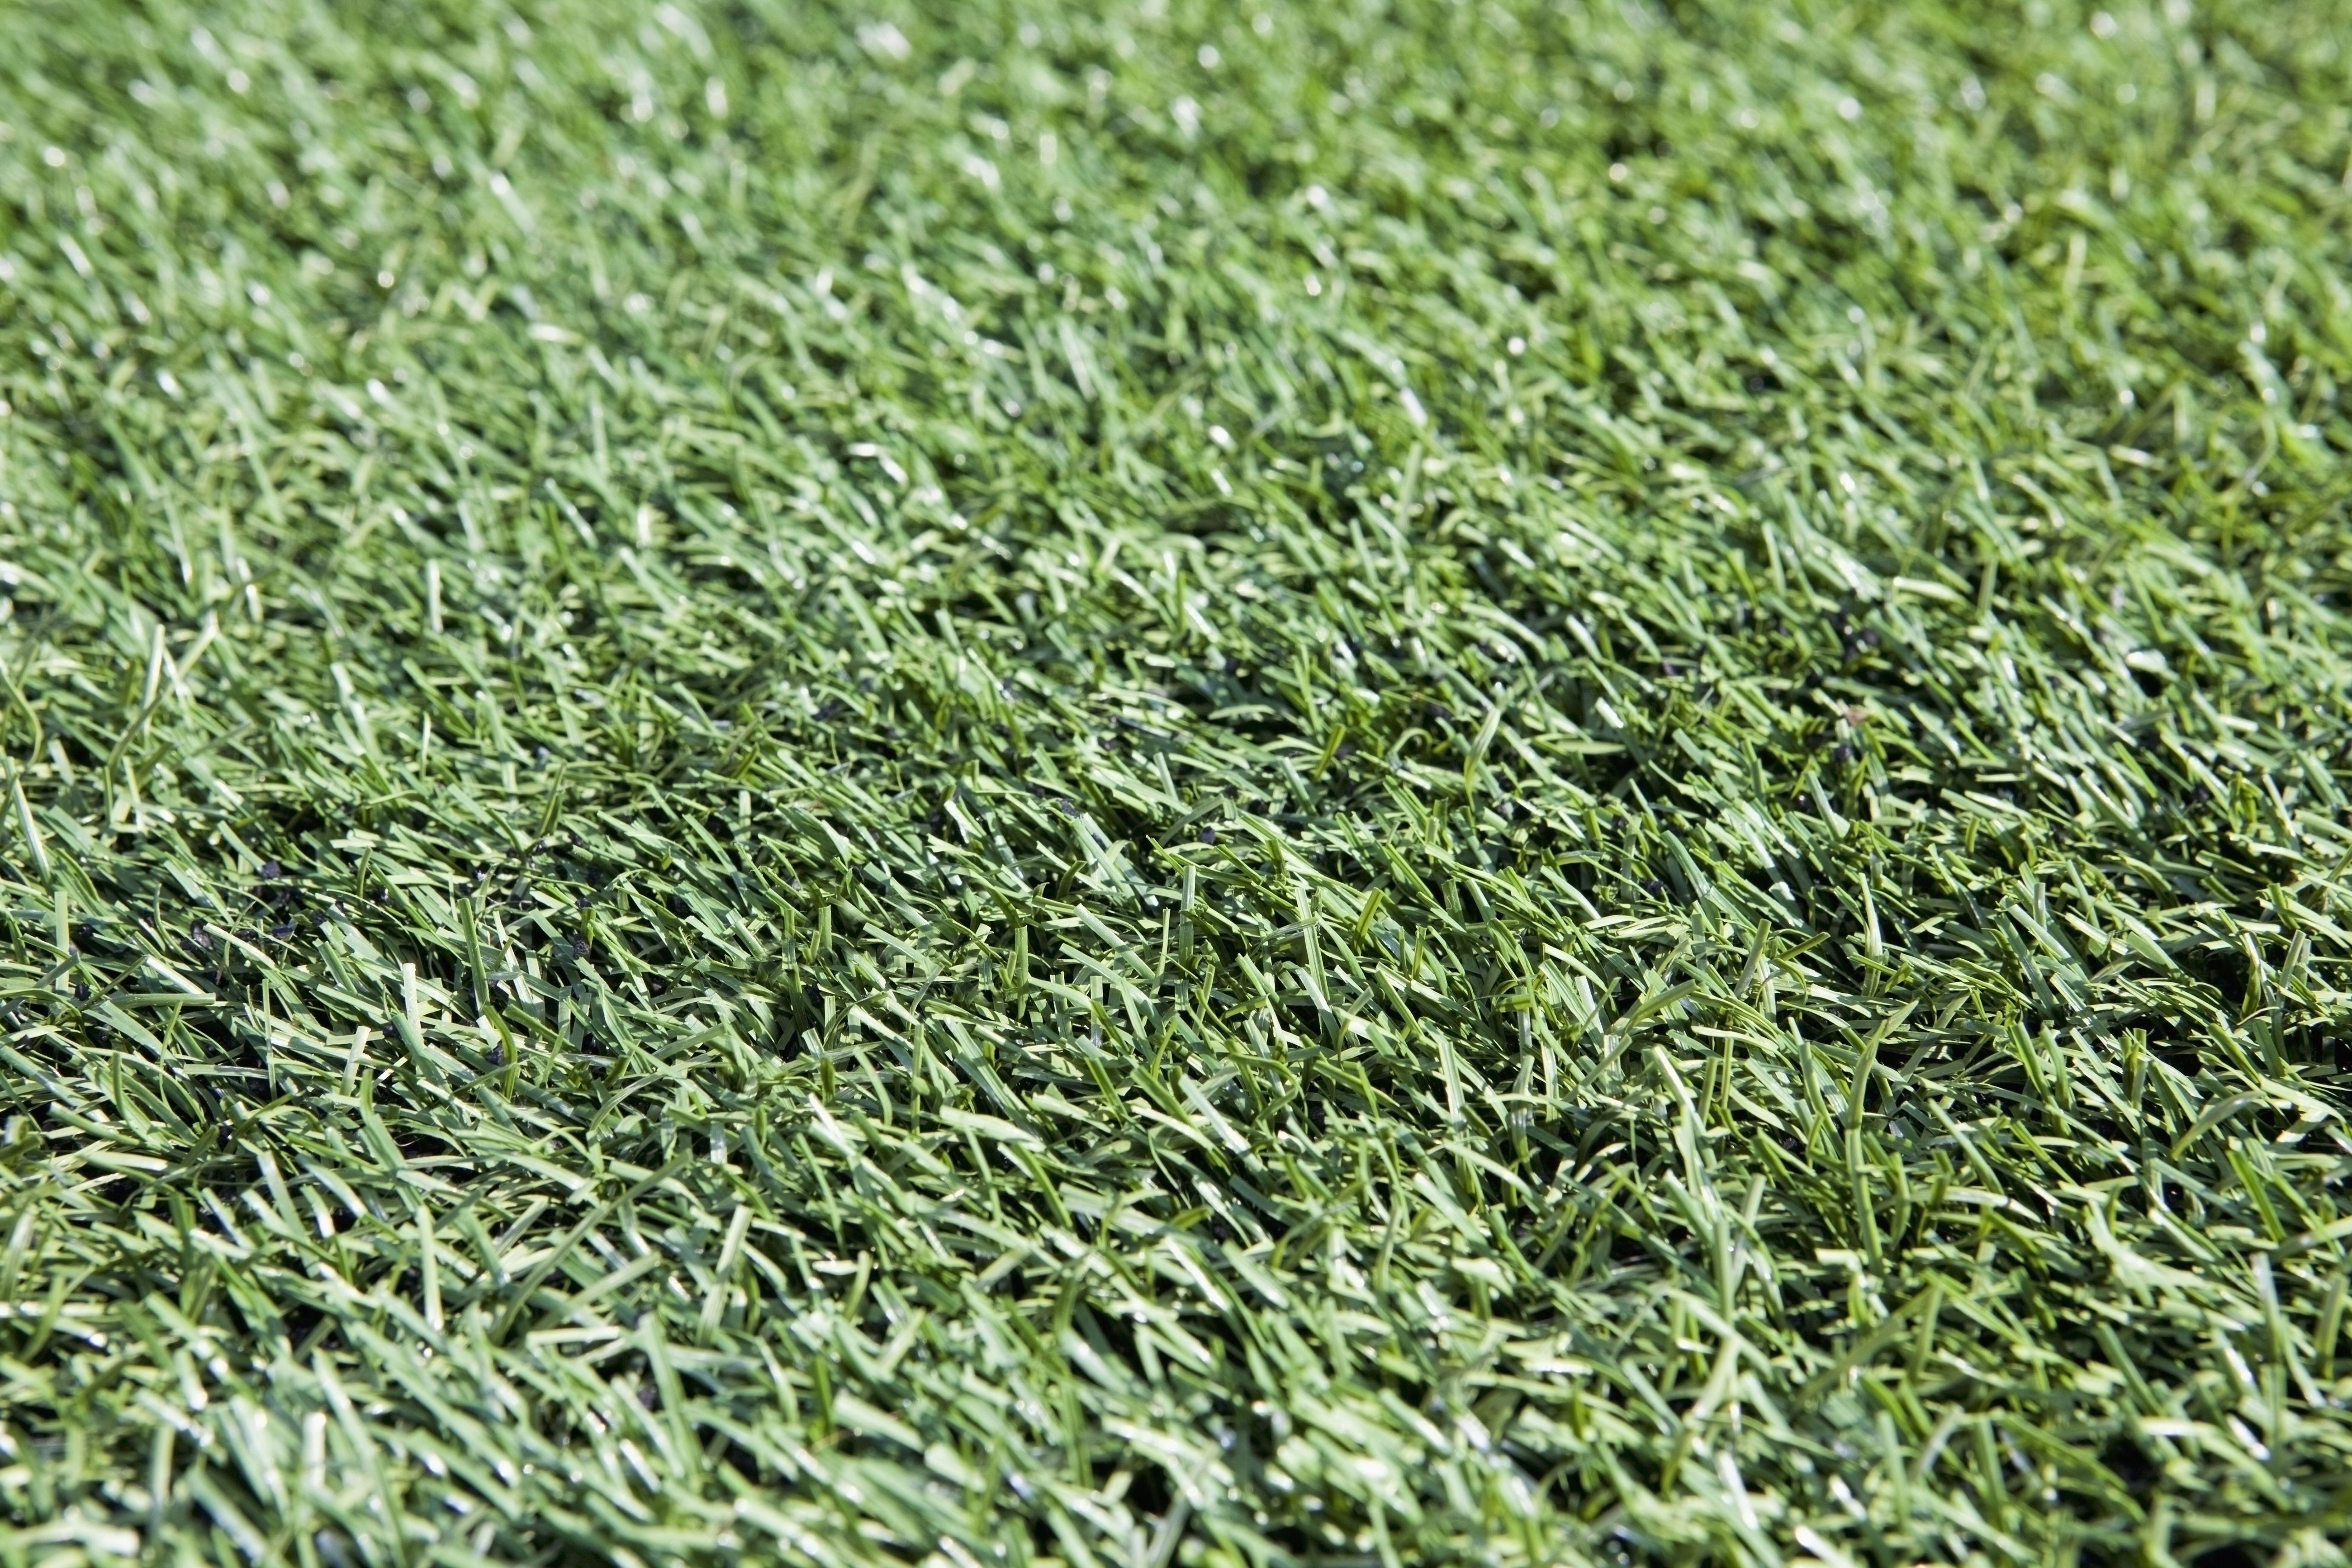 USA, Oregon, Tigard, full frame of artificial turf